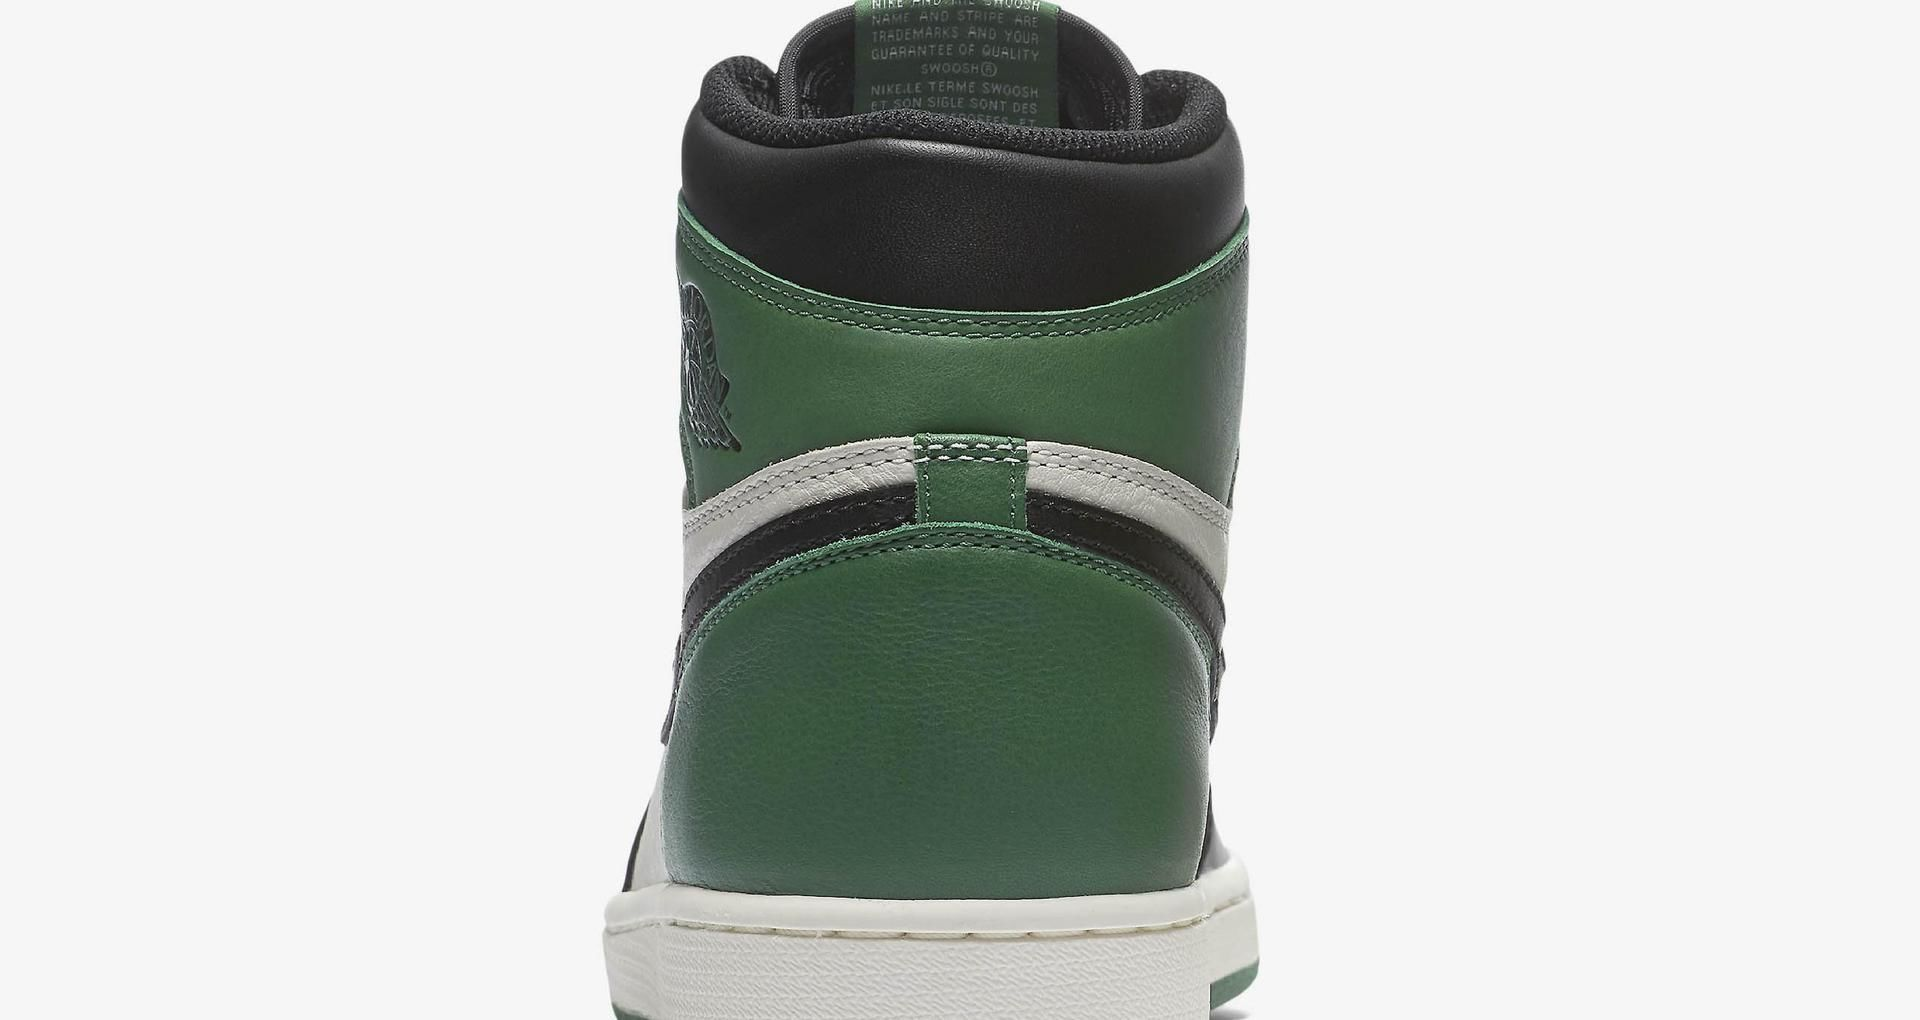 save off 6bb96 c7719 Air Jordan 1 Retro  Pine Green  Release Date